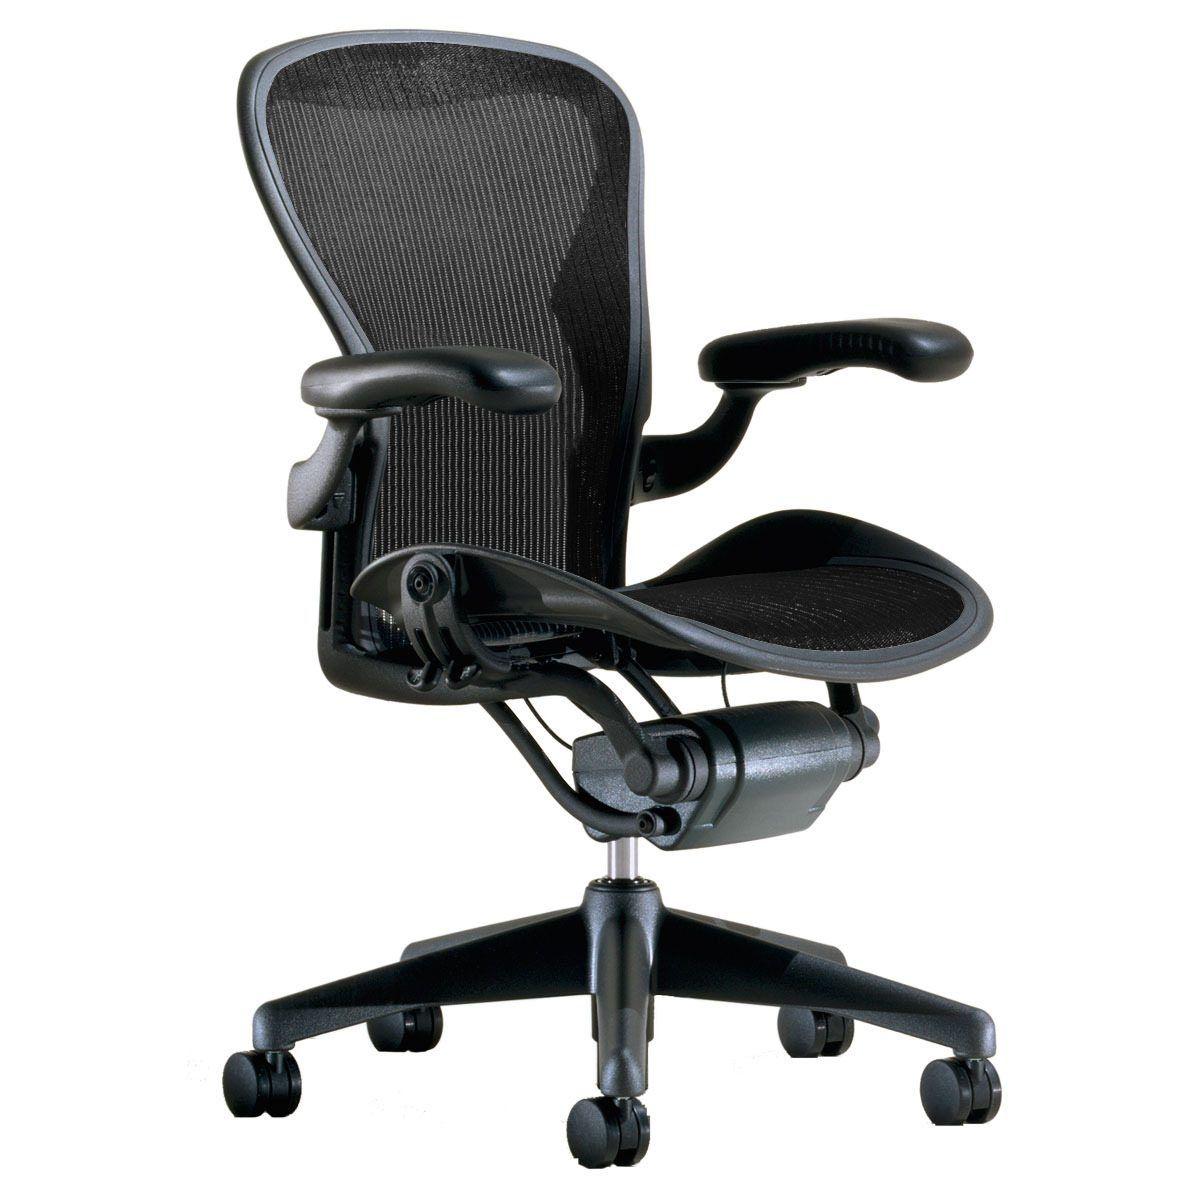 Best Office Desk Chair For Back Pain Ergonomicofficechairbackpain